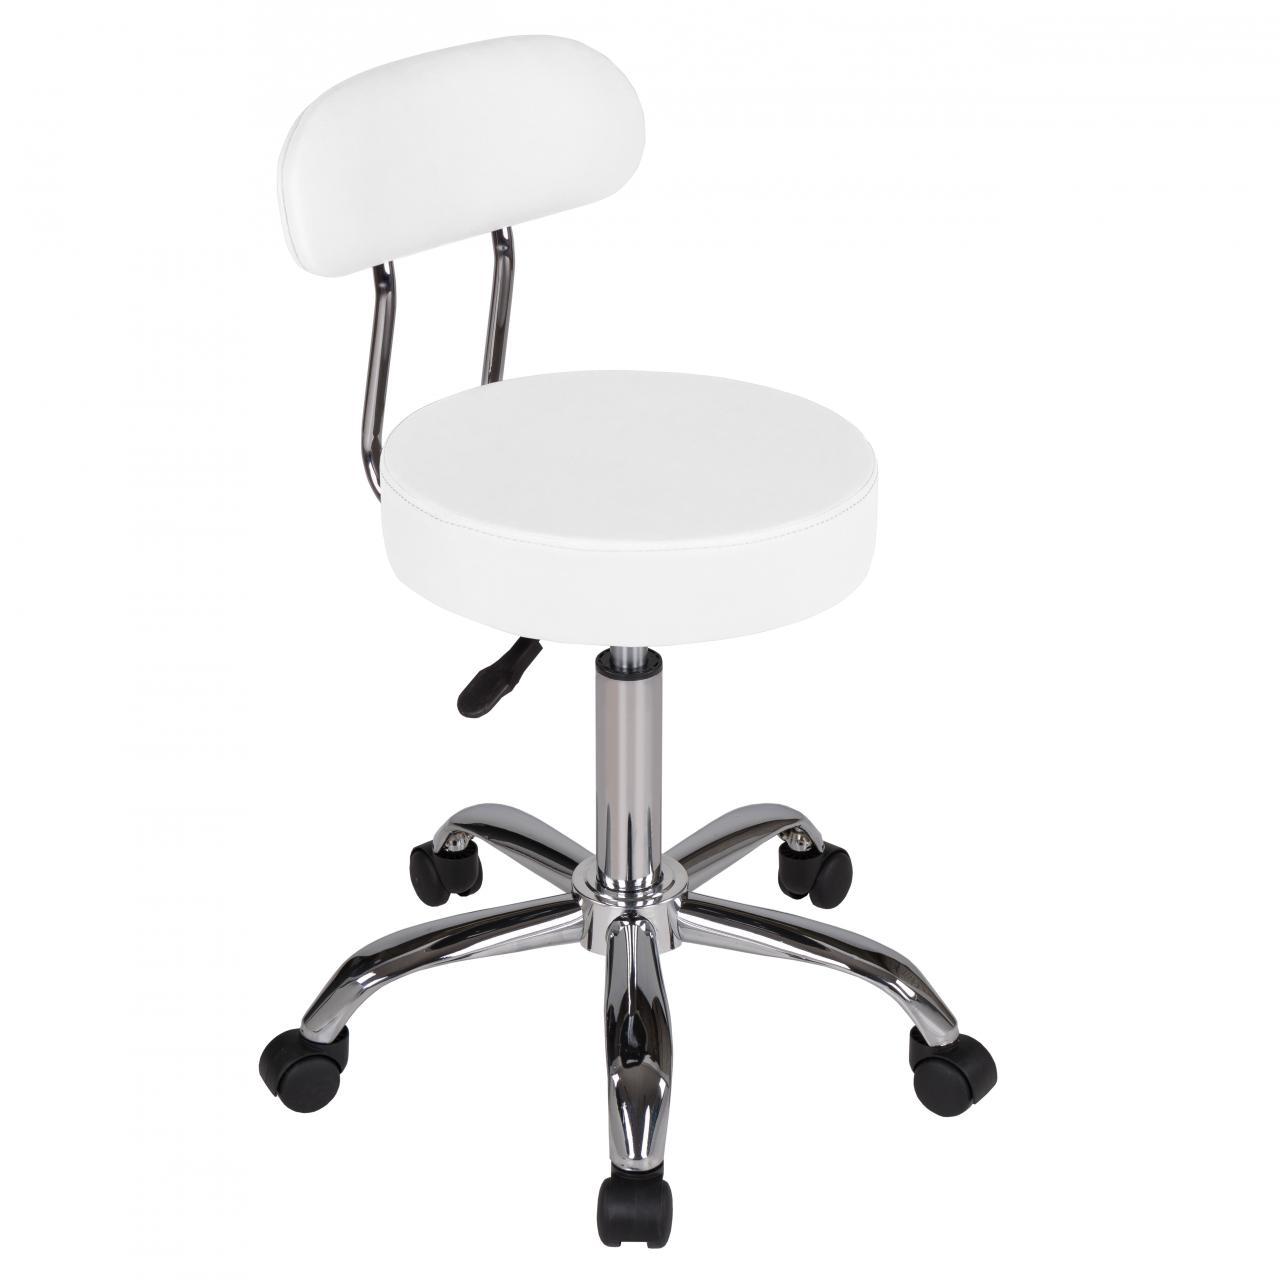 drehhocker mit lehne rollhocker hocker arbeitshocker drehstuhl praxishocker ebay. Black Bedroom Furniture Sets. Home Design Ideas